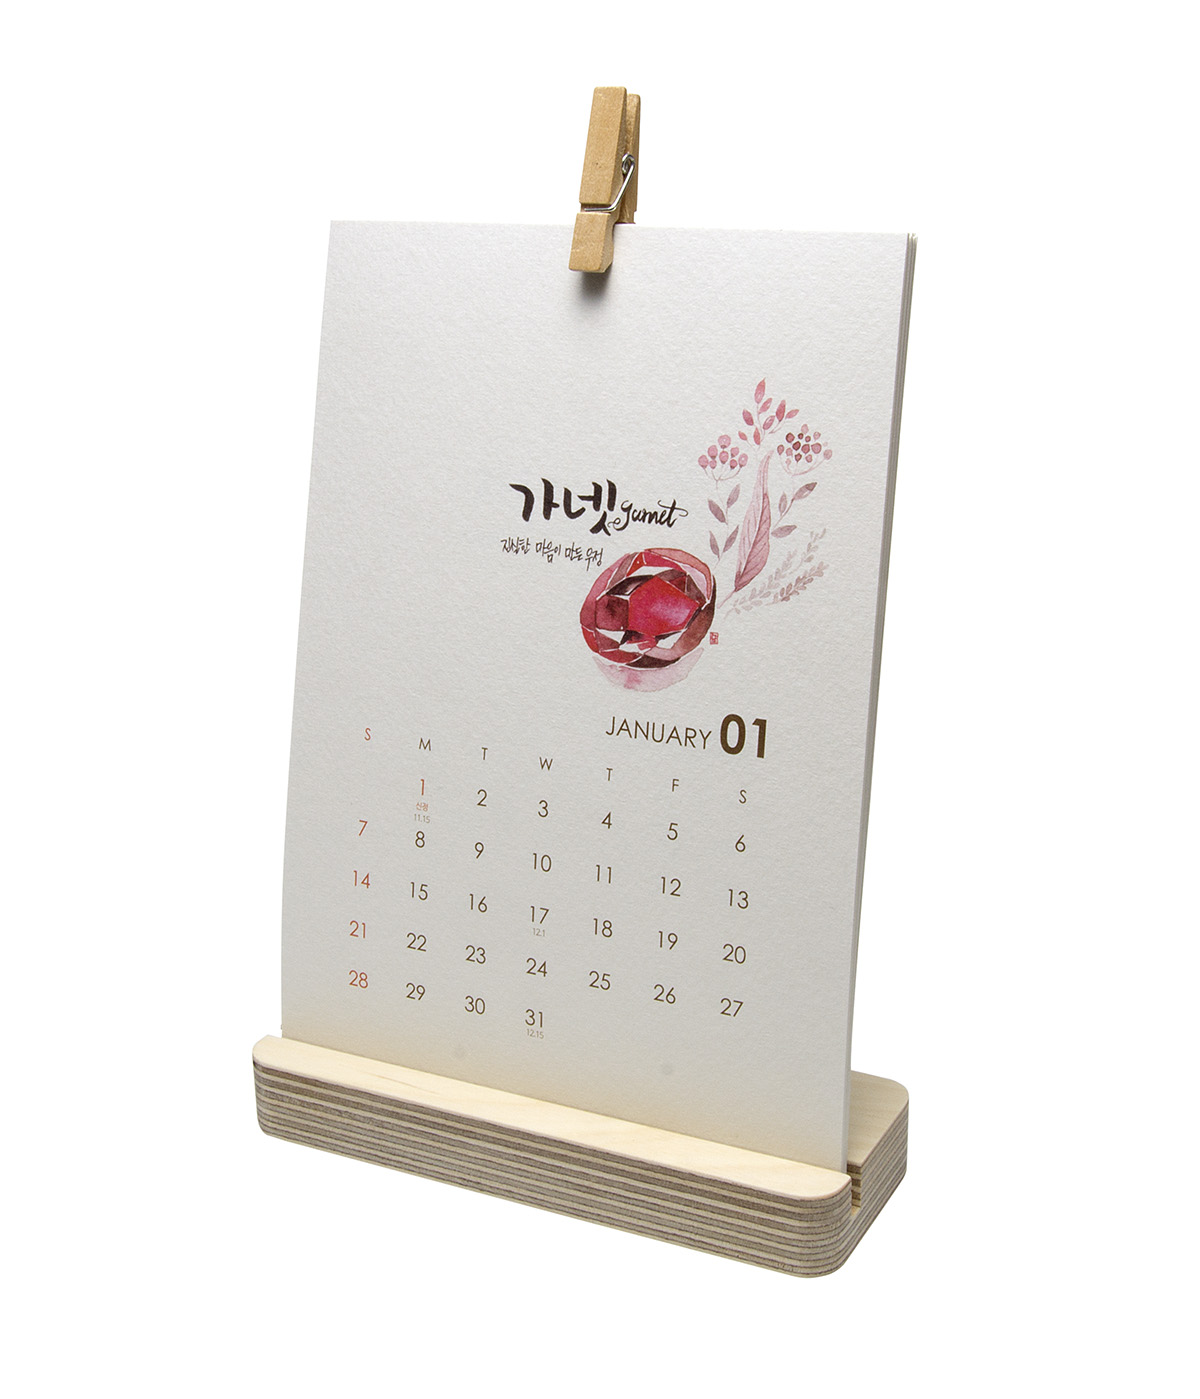 2018 Birthstone Calendar Thumbnail Image 6